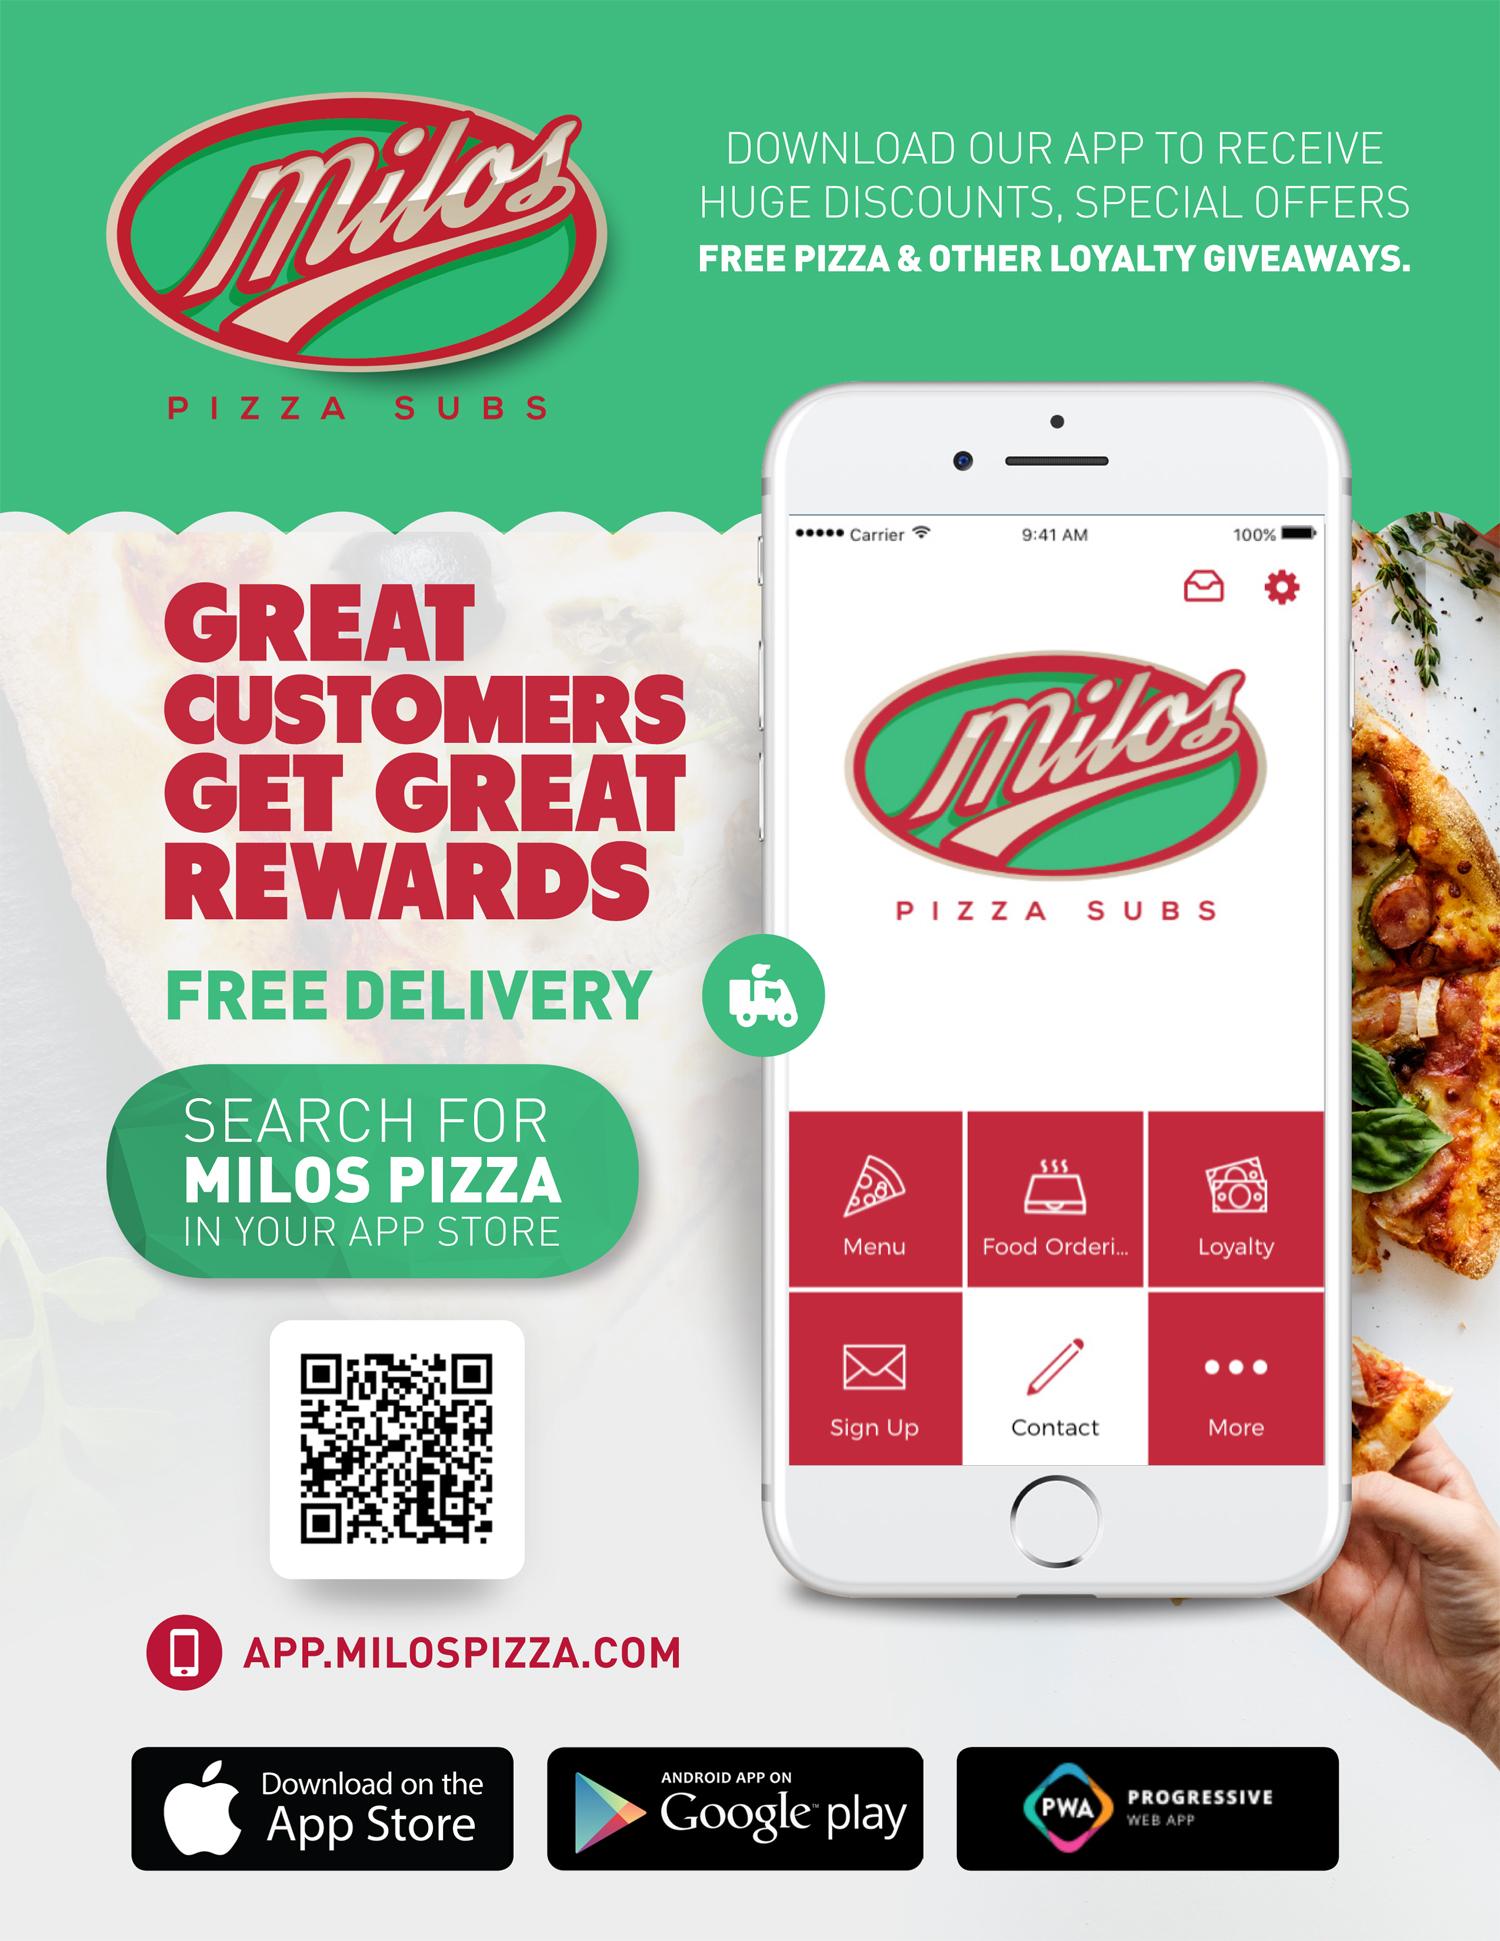 milos pizza app